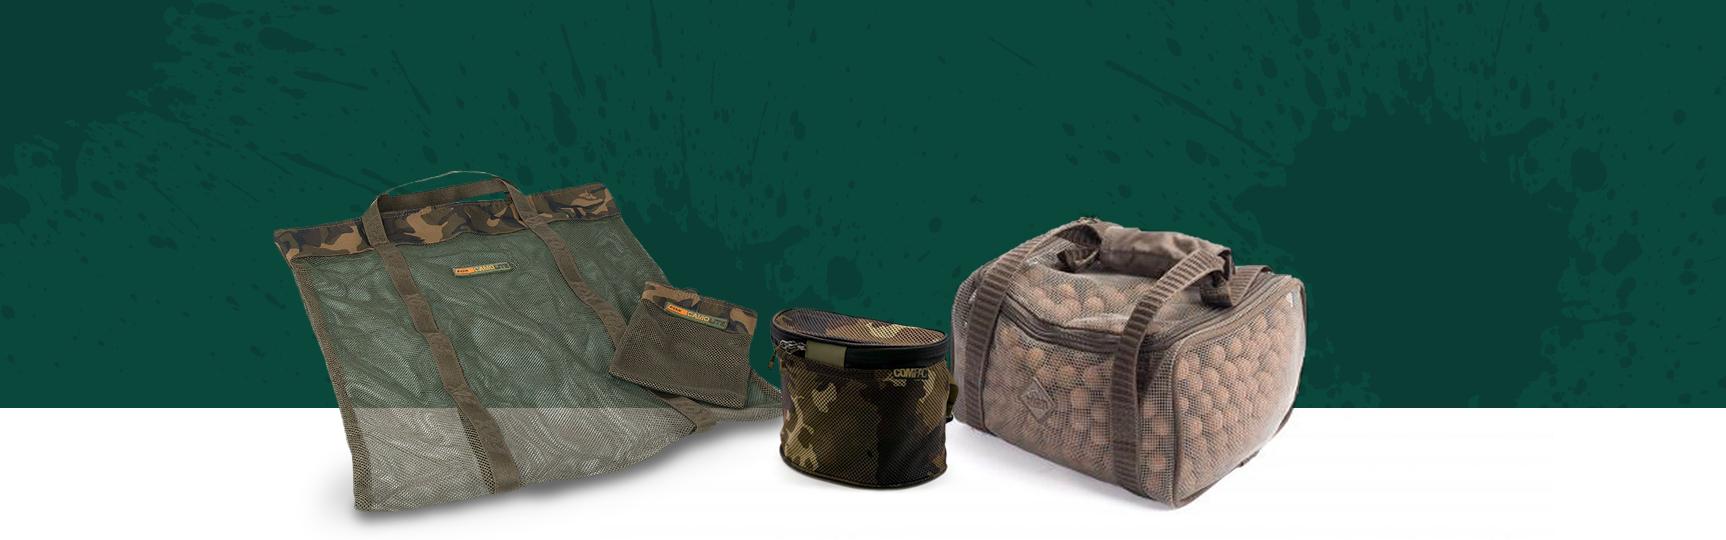 Boilie Dry Bags, Bait Caddys, Bait Bags